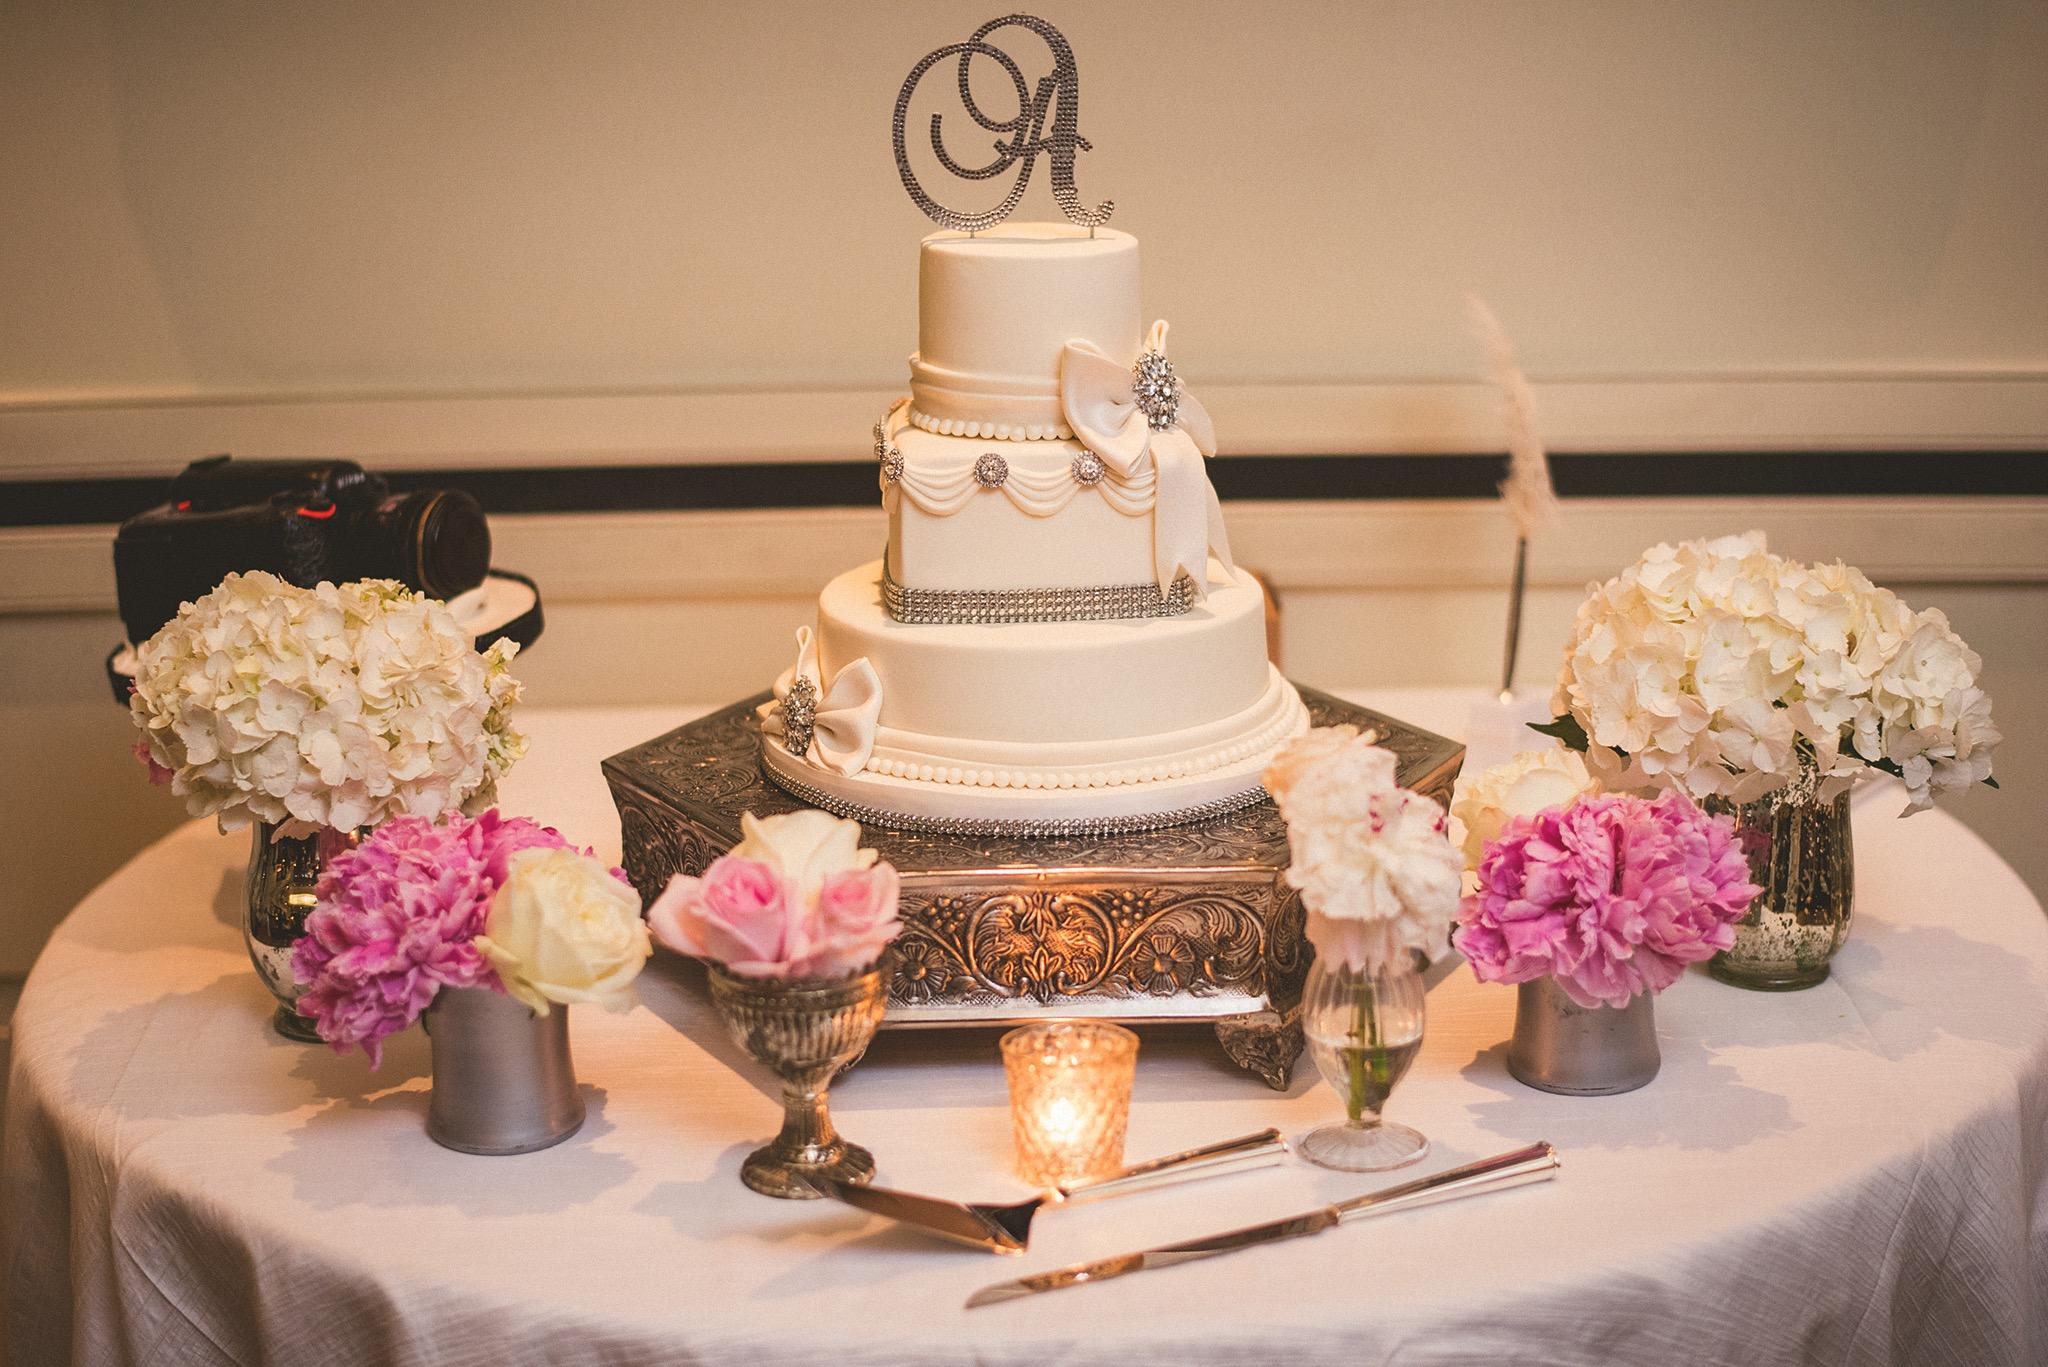 73-photographers-wedding-cake.jpg